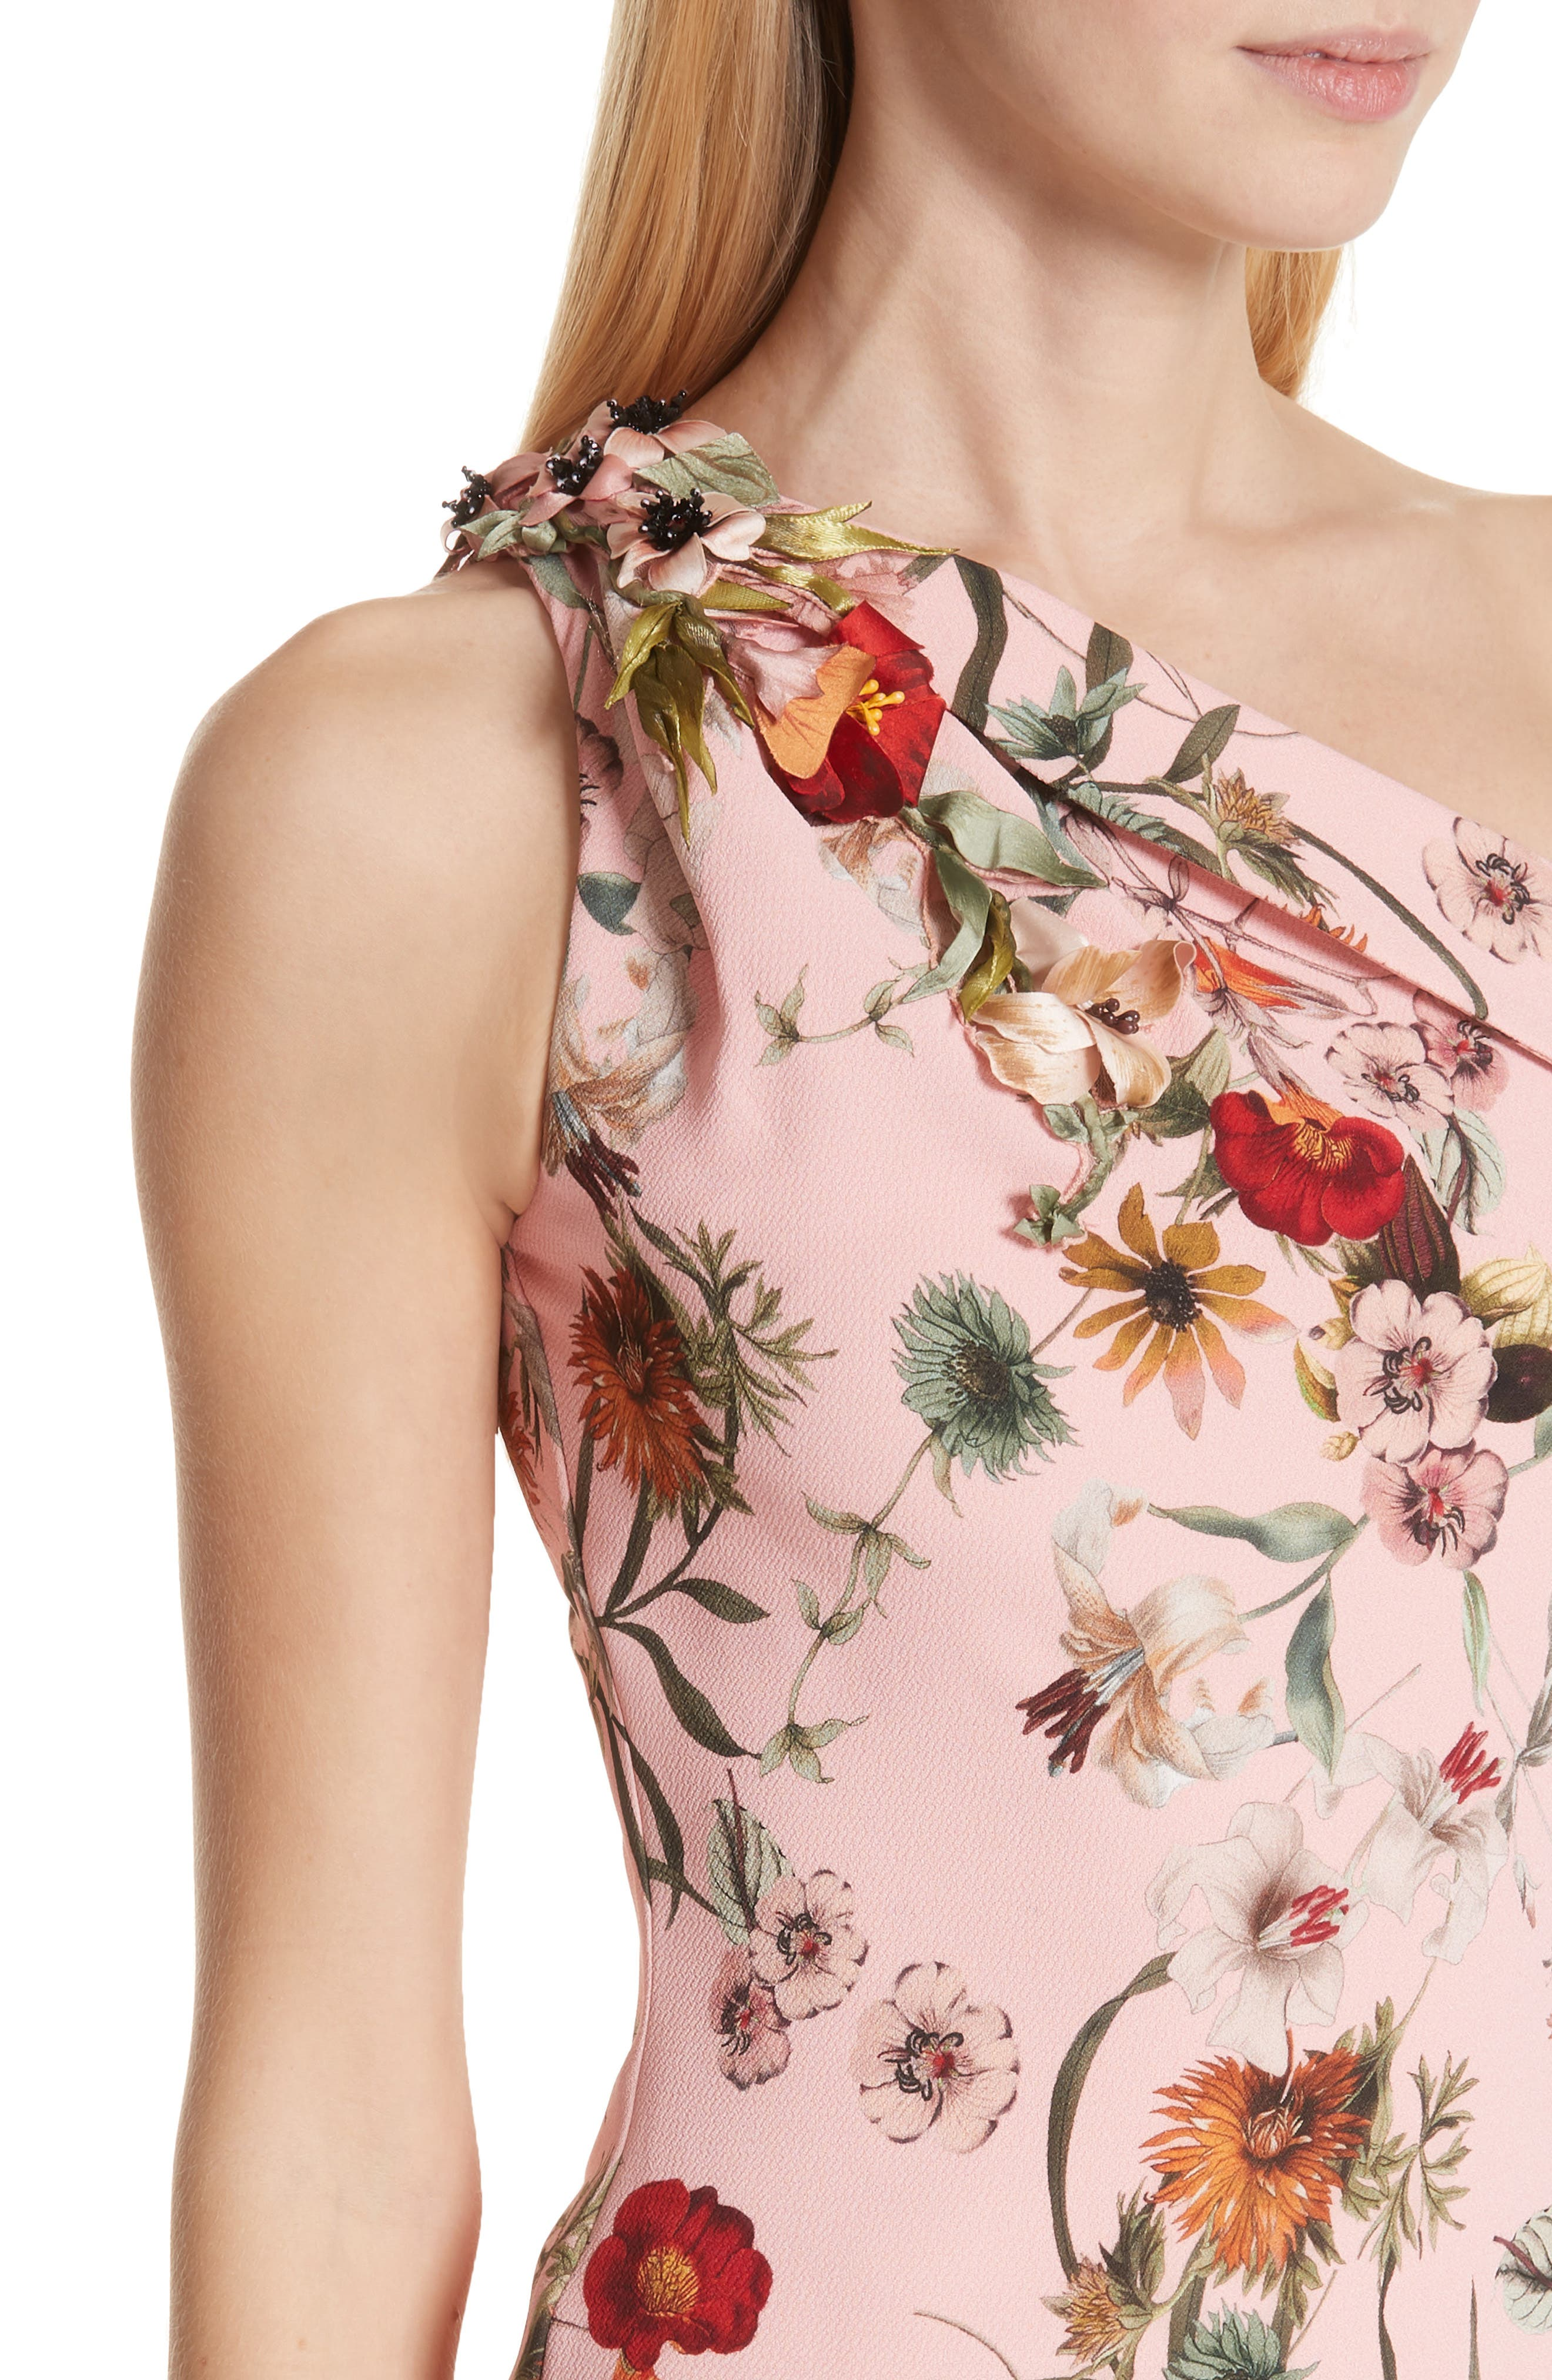 BADGLEY MISCHKA COLLECTION,                             Badgley Mischka One-Shoulder Floral Evening Dress,                             Alternate thumbnail 4, color,                             650